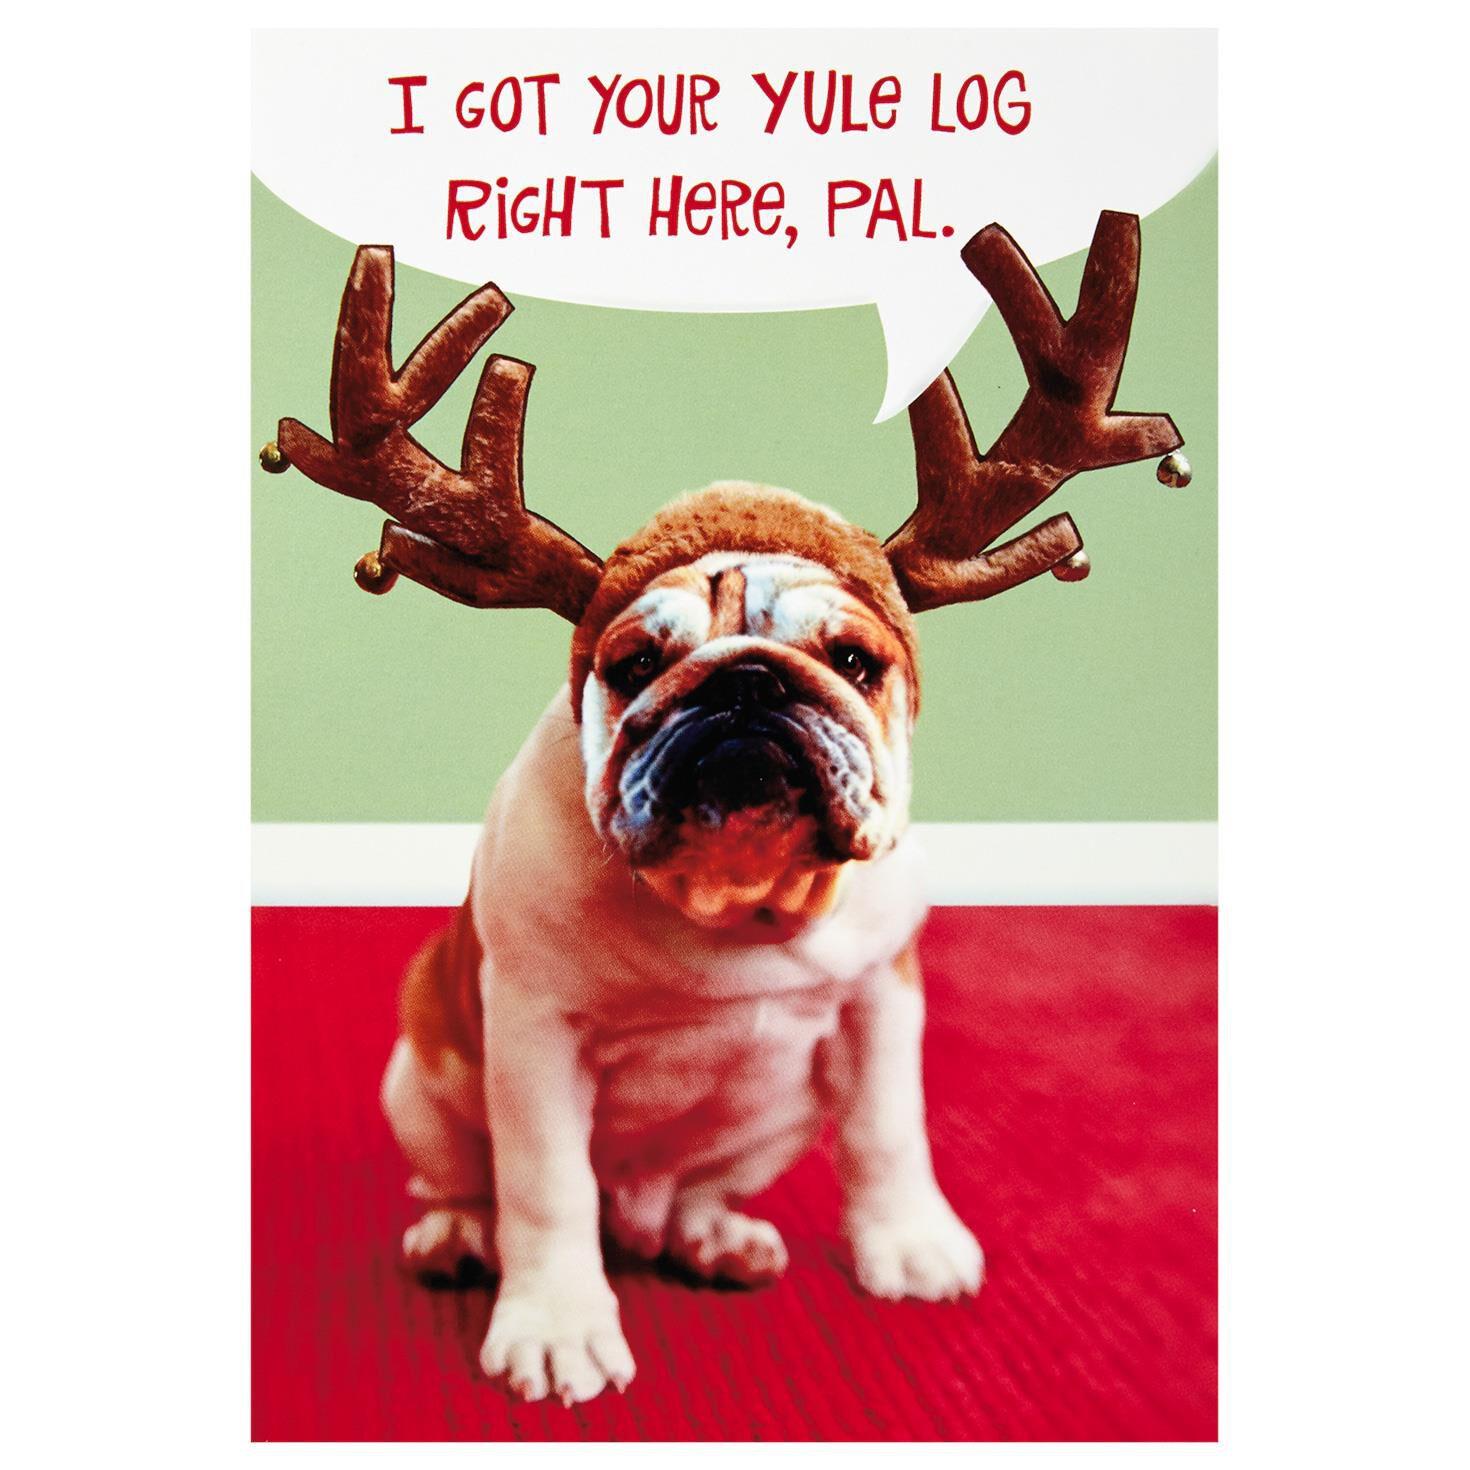 Funny Dog Christmas Cards | www.topsimages.com